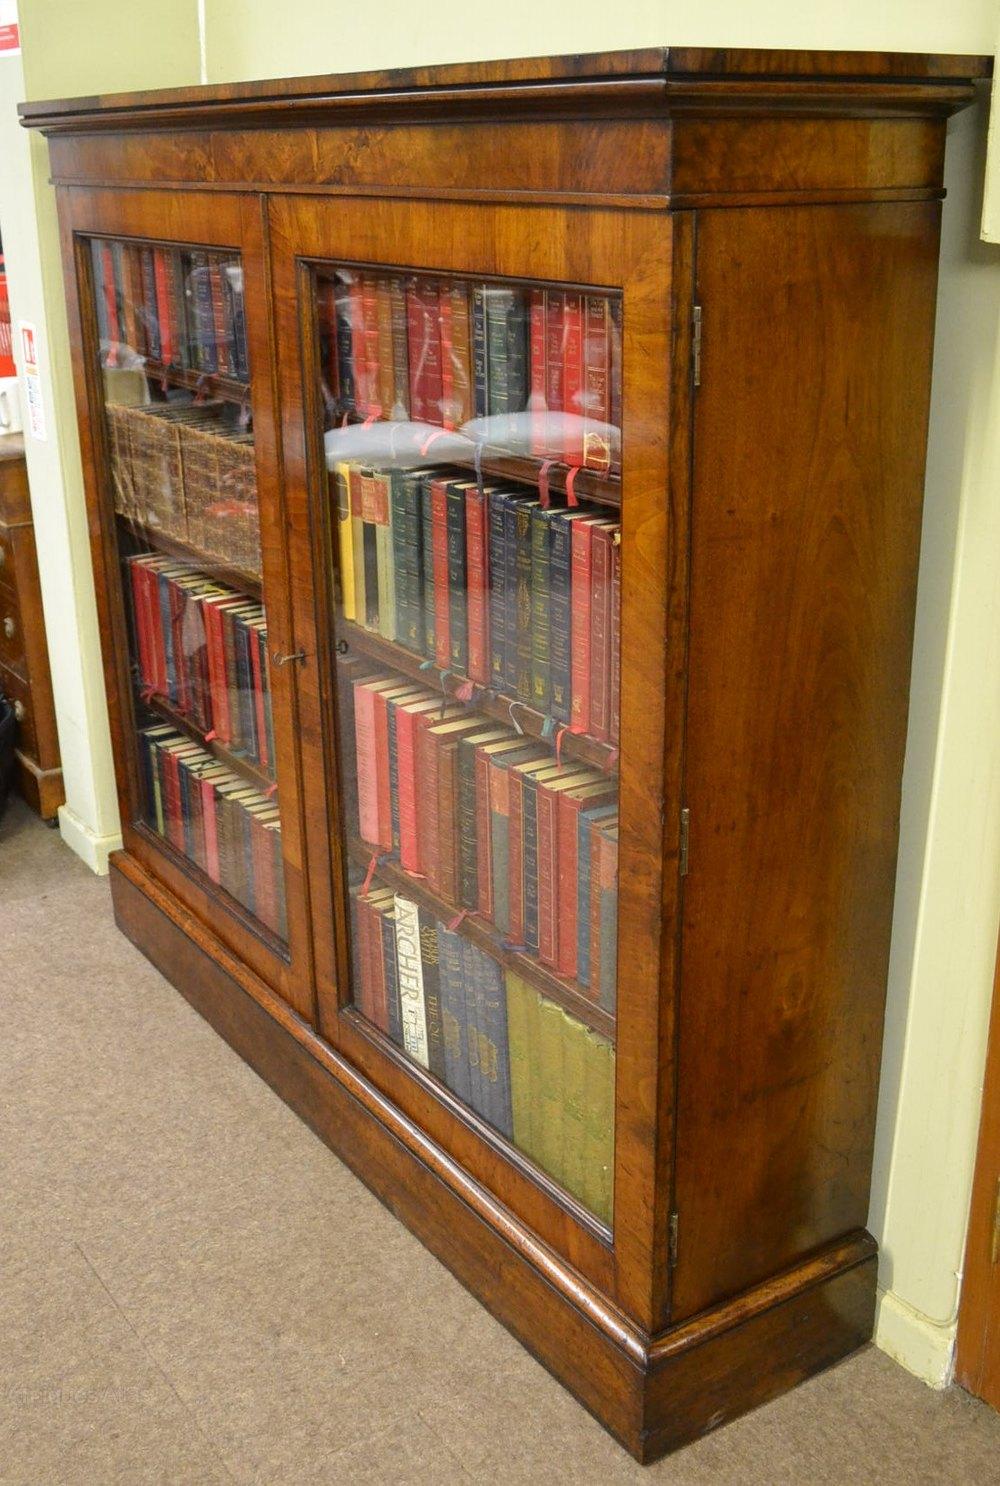 walnut bookcase c  antiques atlas - walnut bookcase c antique glazed bookcases bookcase walnut